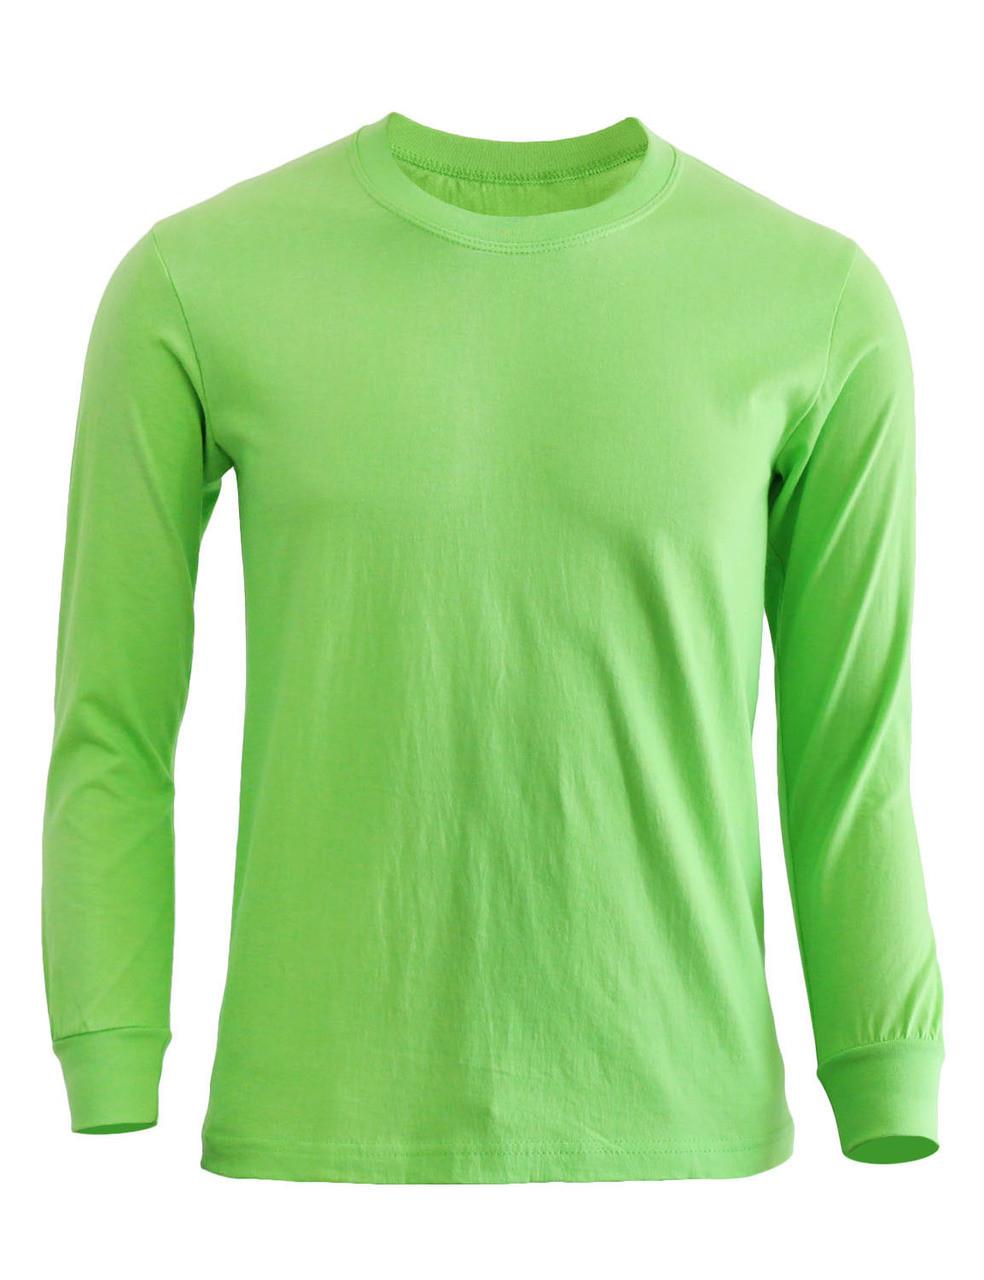 14064638b Basic round neck style cotton T-shirt Crew neck long sleeves shirt-Light  green